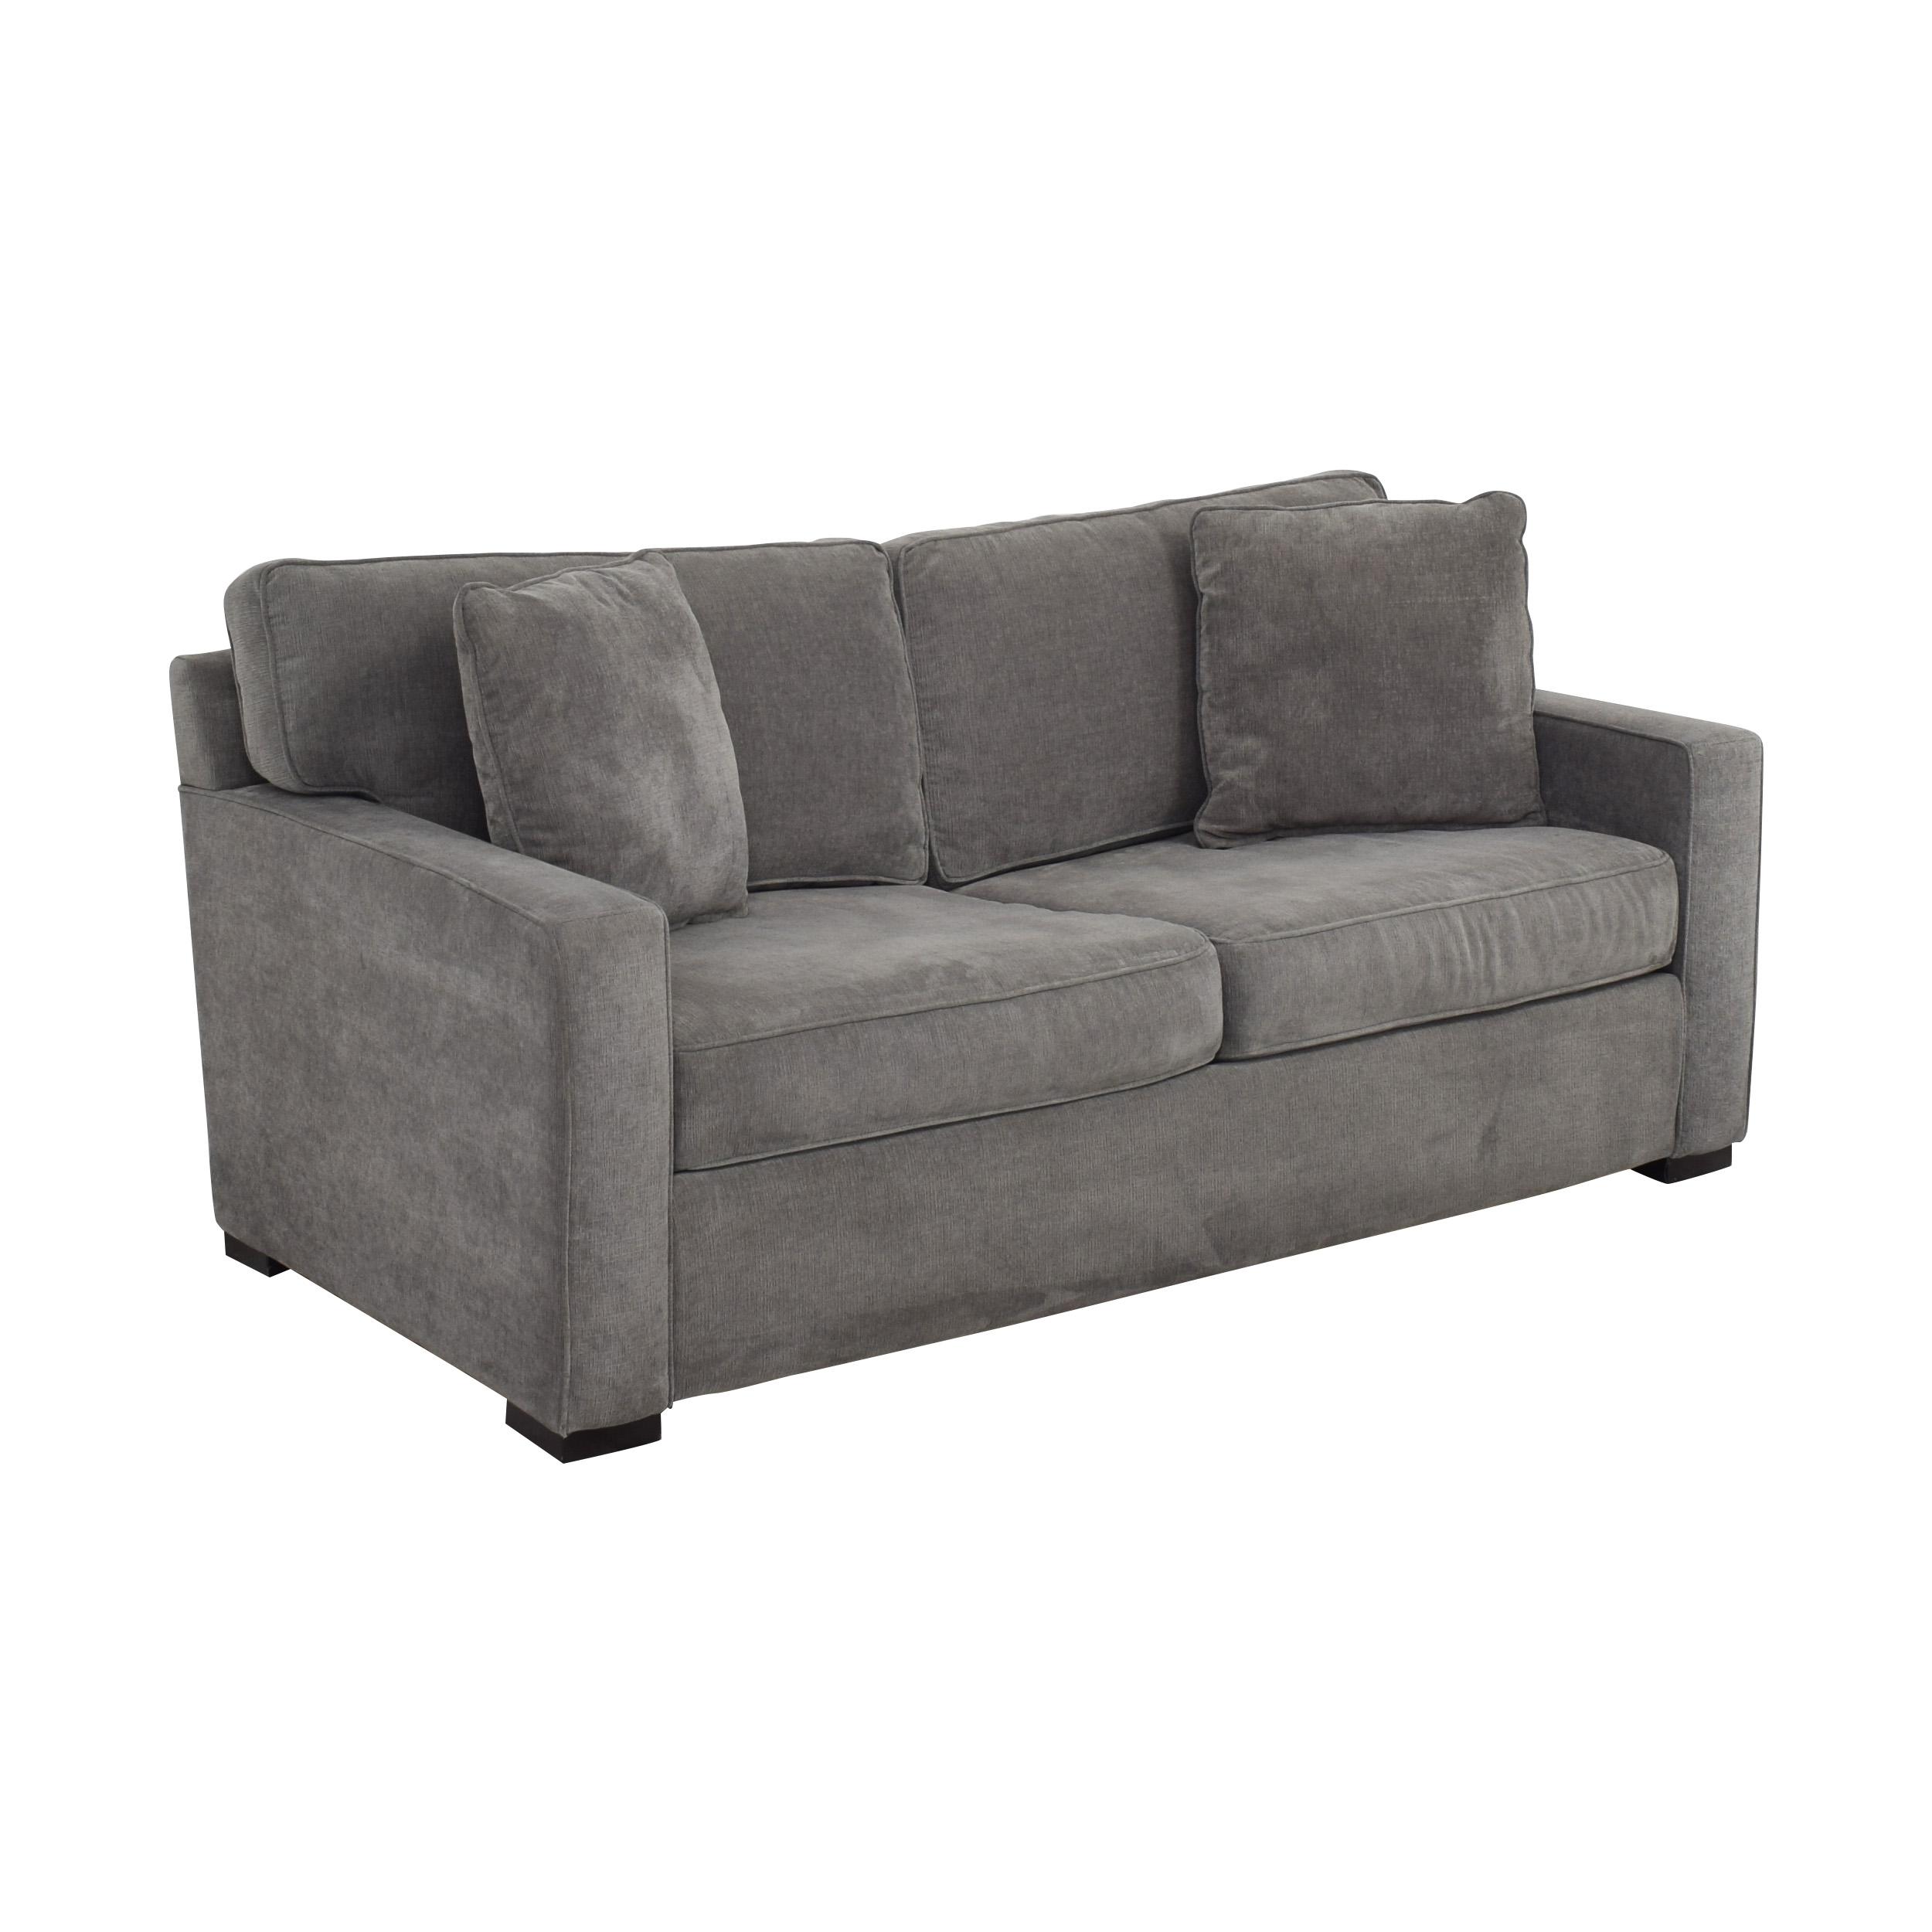 Macy's Macy's Radley Full Sleeper Sofa Bed discount